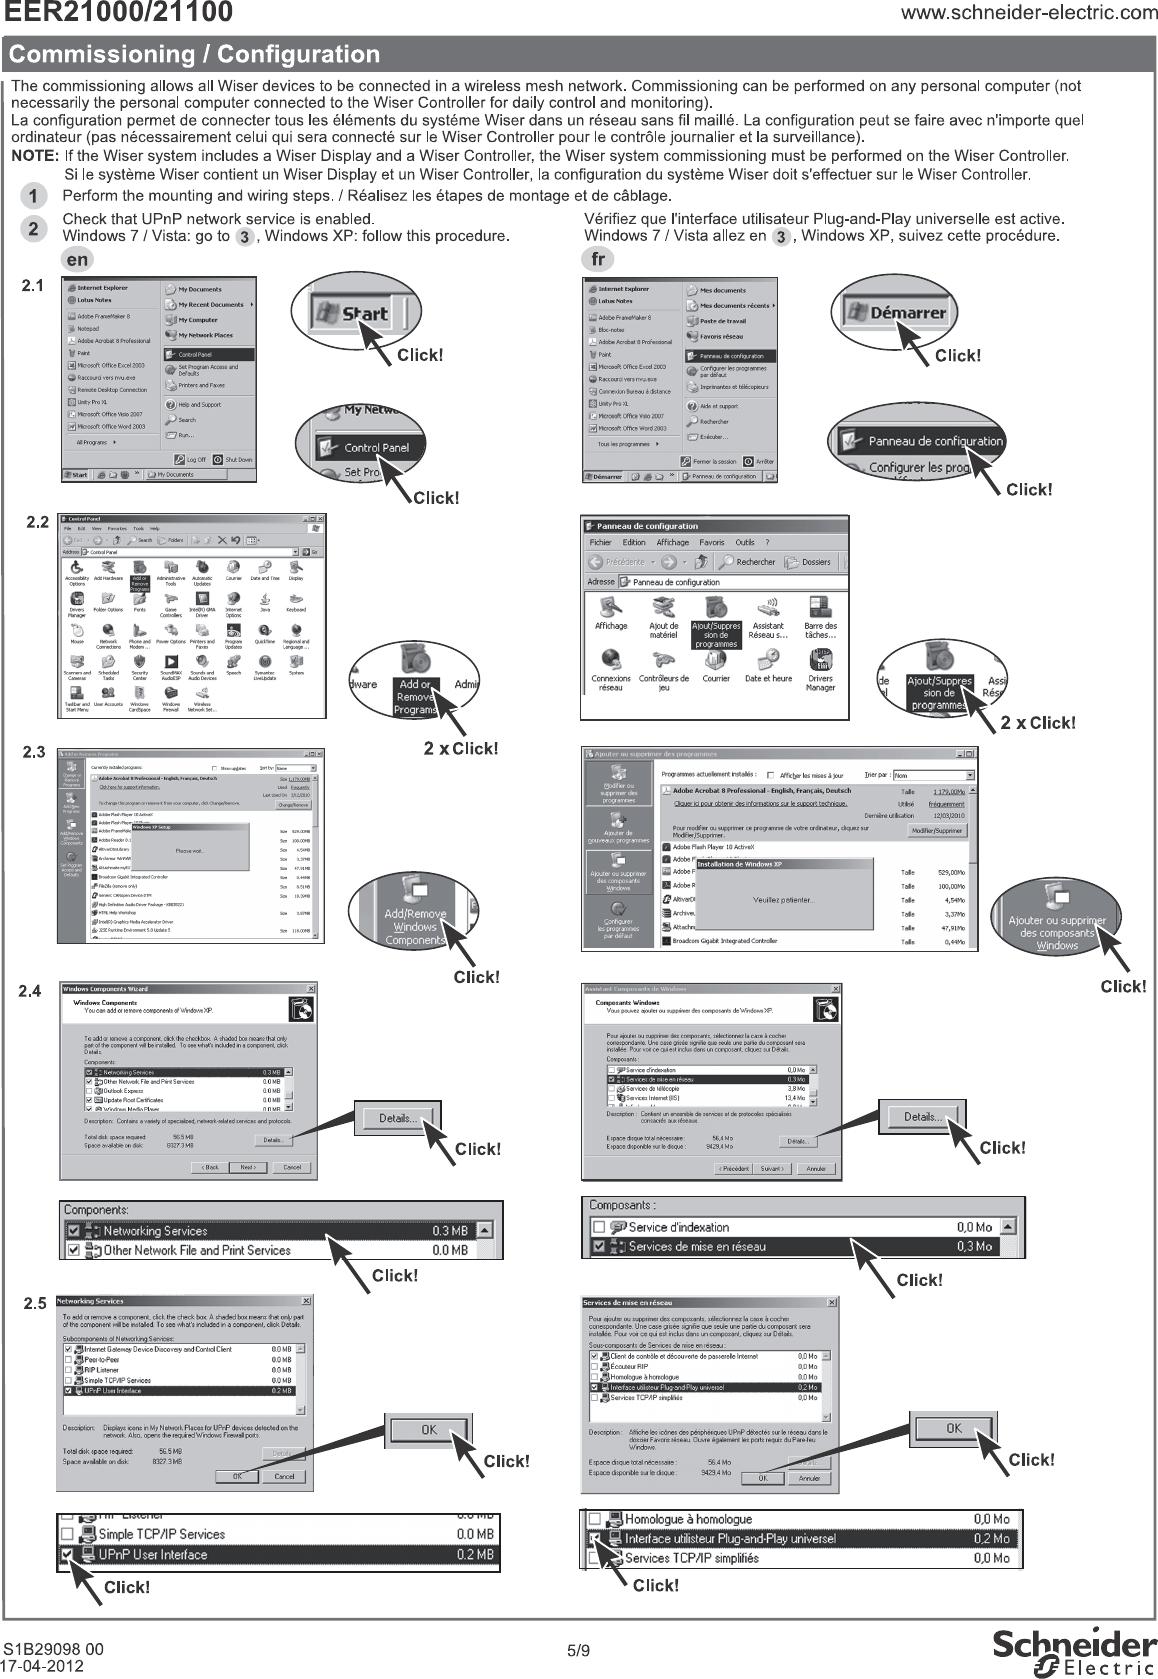 Schneider Electric EER21000 Wiser Controller User Manual